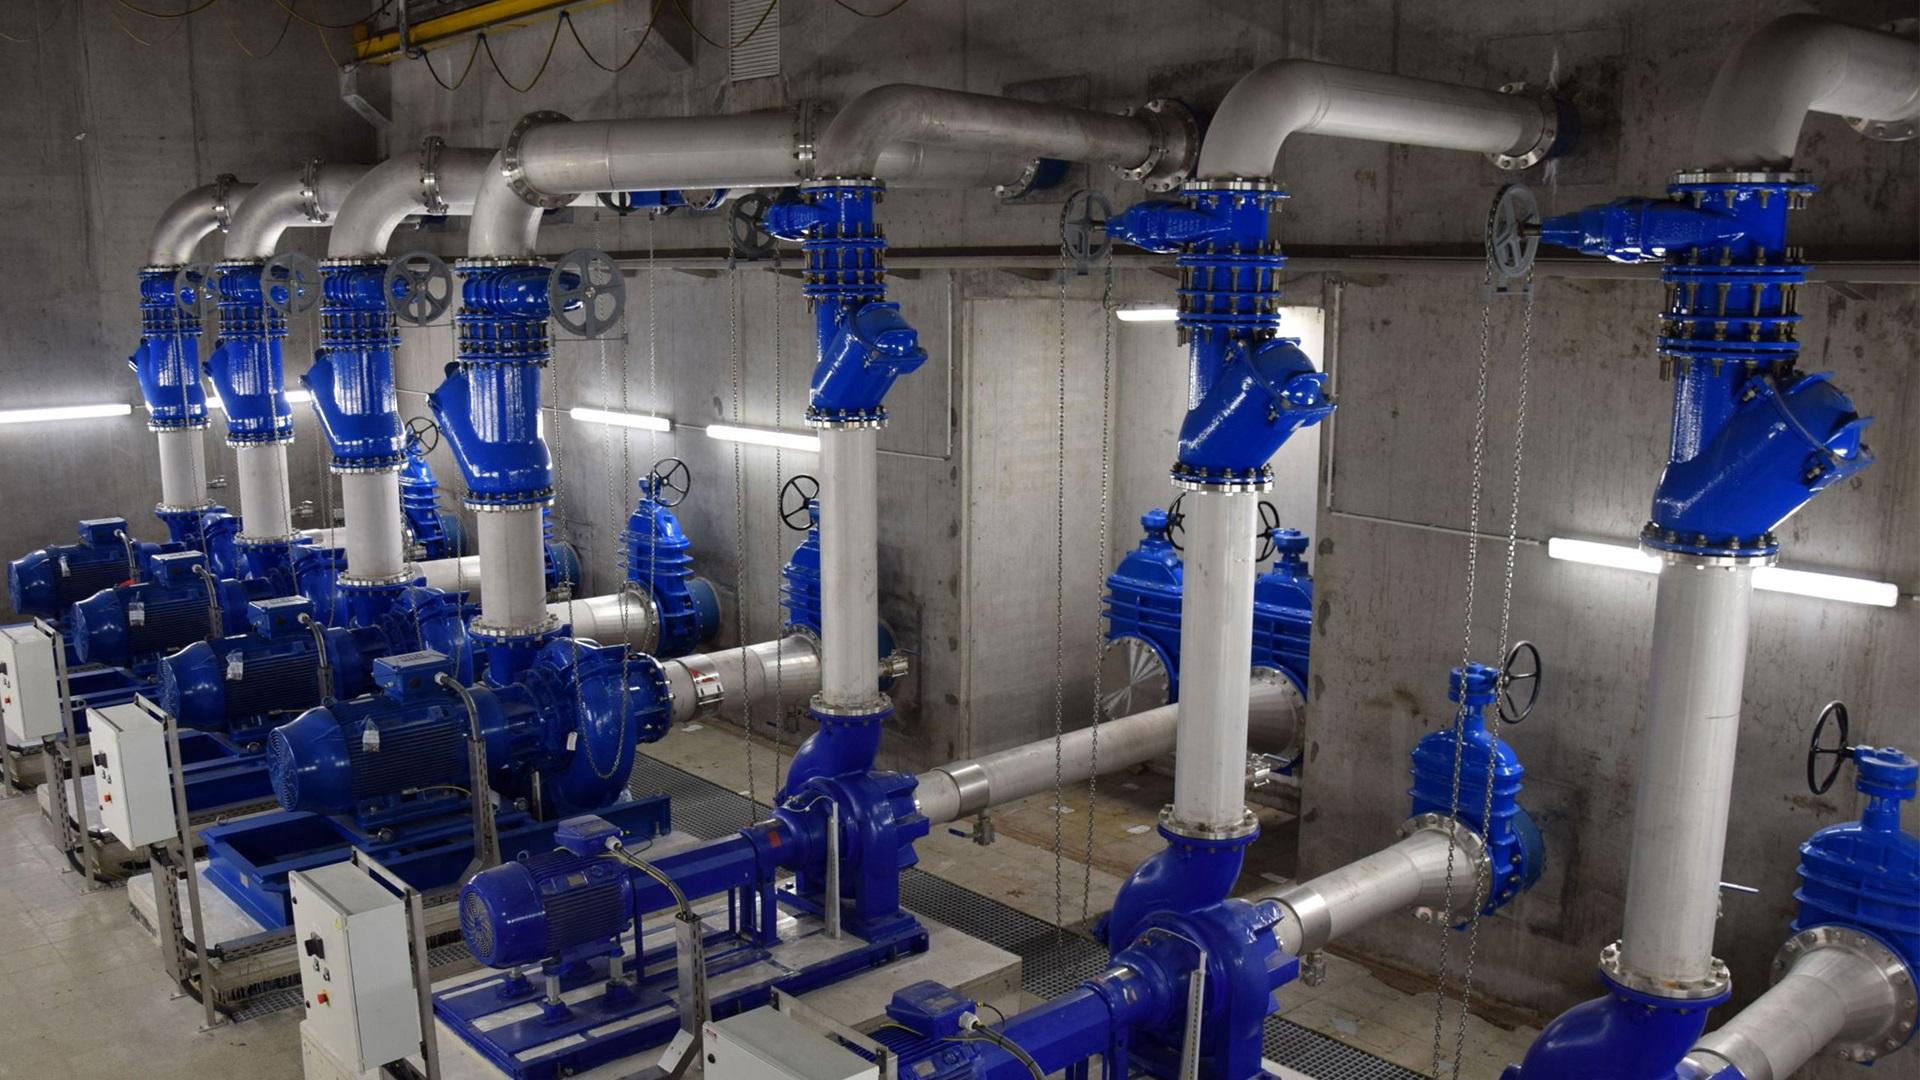 AVK valves at wastewater pumping station Sint-Kruis in Brugge, Belgium